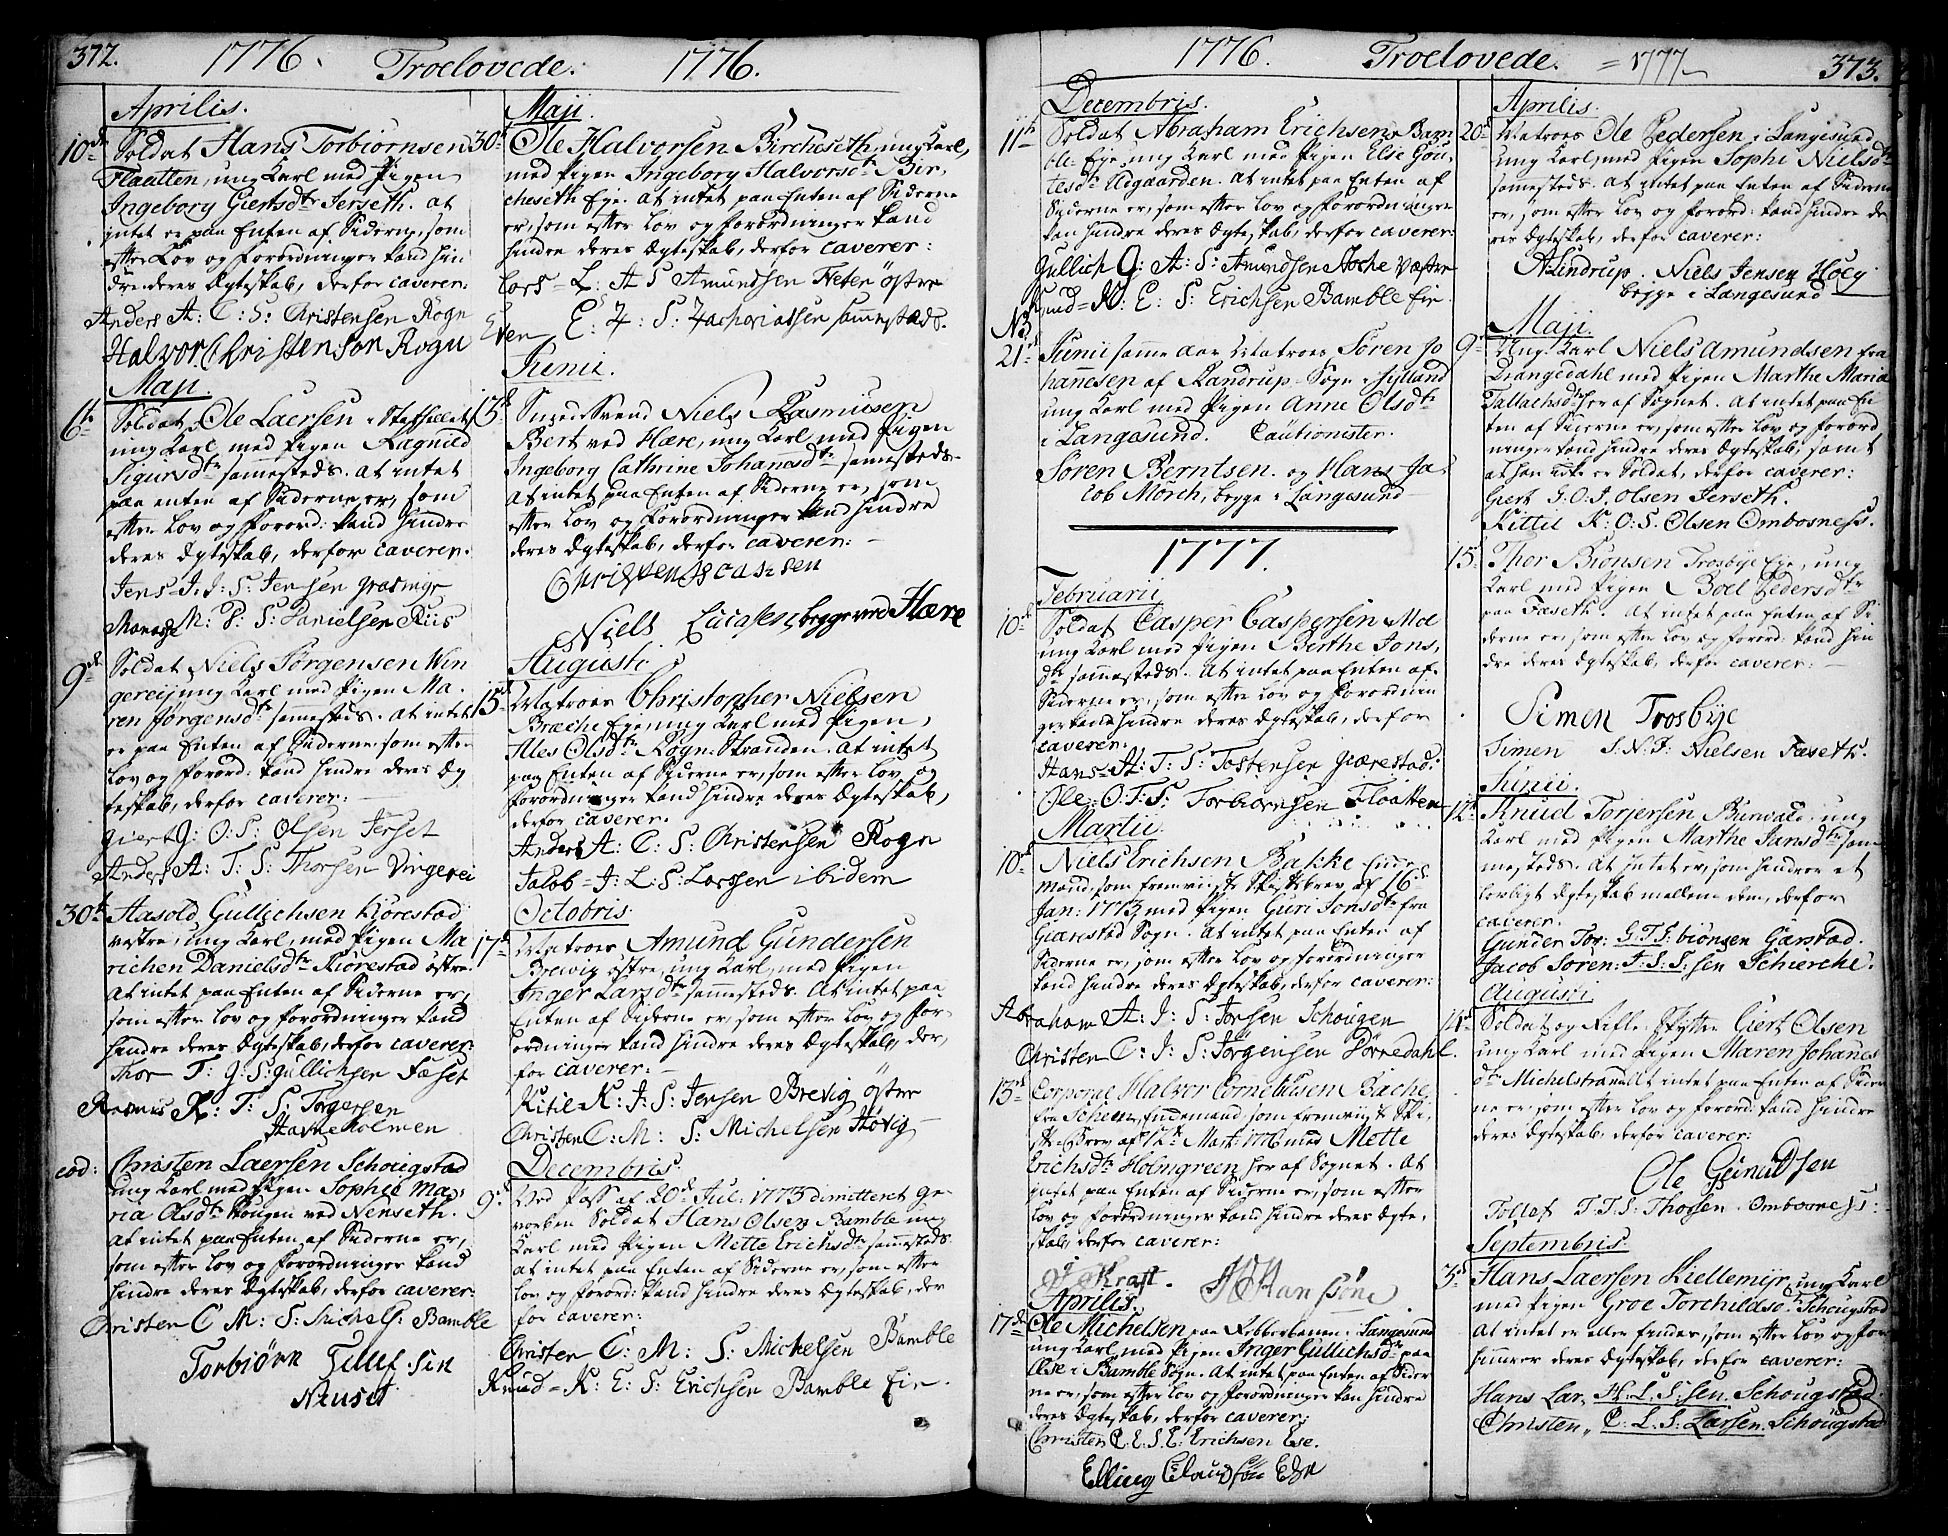 SAKO, Bamble kirkebøker, F/Fa/L0002: Ministerialbok nr. I 2, 1775-1814, s. 372-373